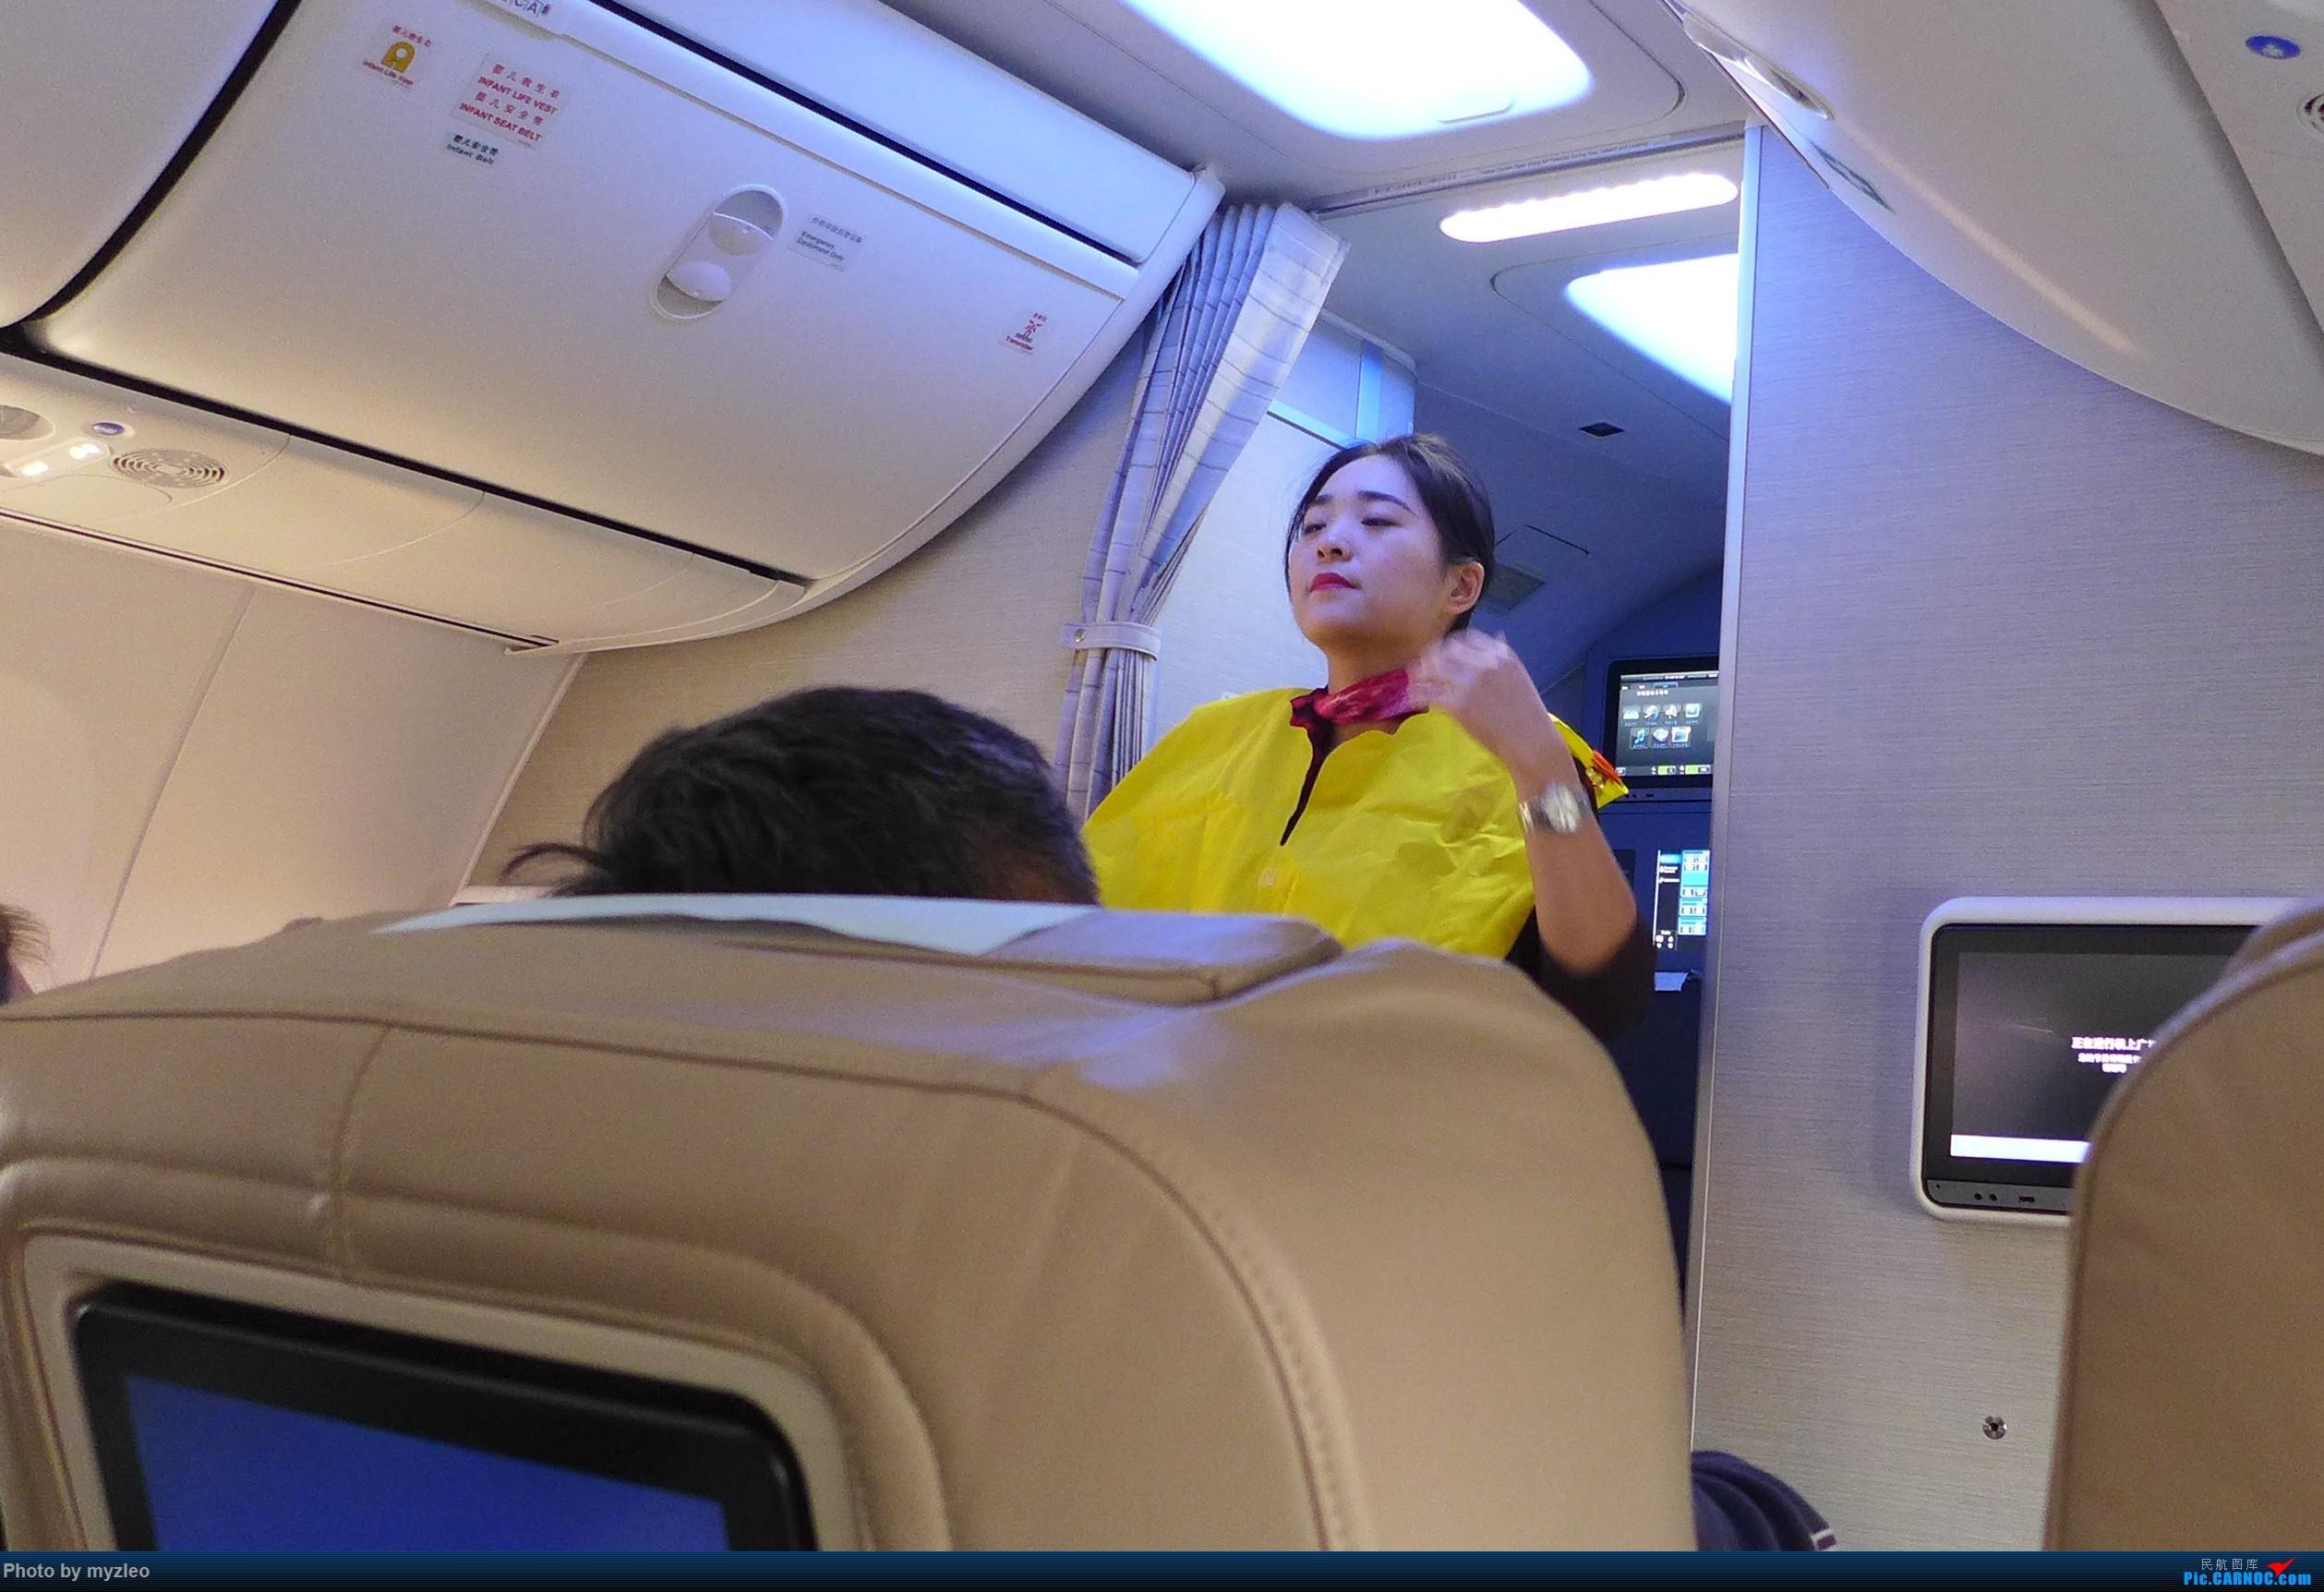 Re:[原创]【myzleo的游记1】六天五晚广州行——SHA-CAN上航商务舱初体验+广州城内 BOEING 737-800 B-1452 中国上海虹桥国际机场